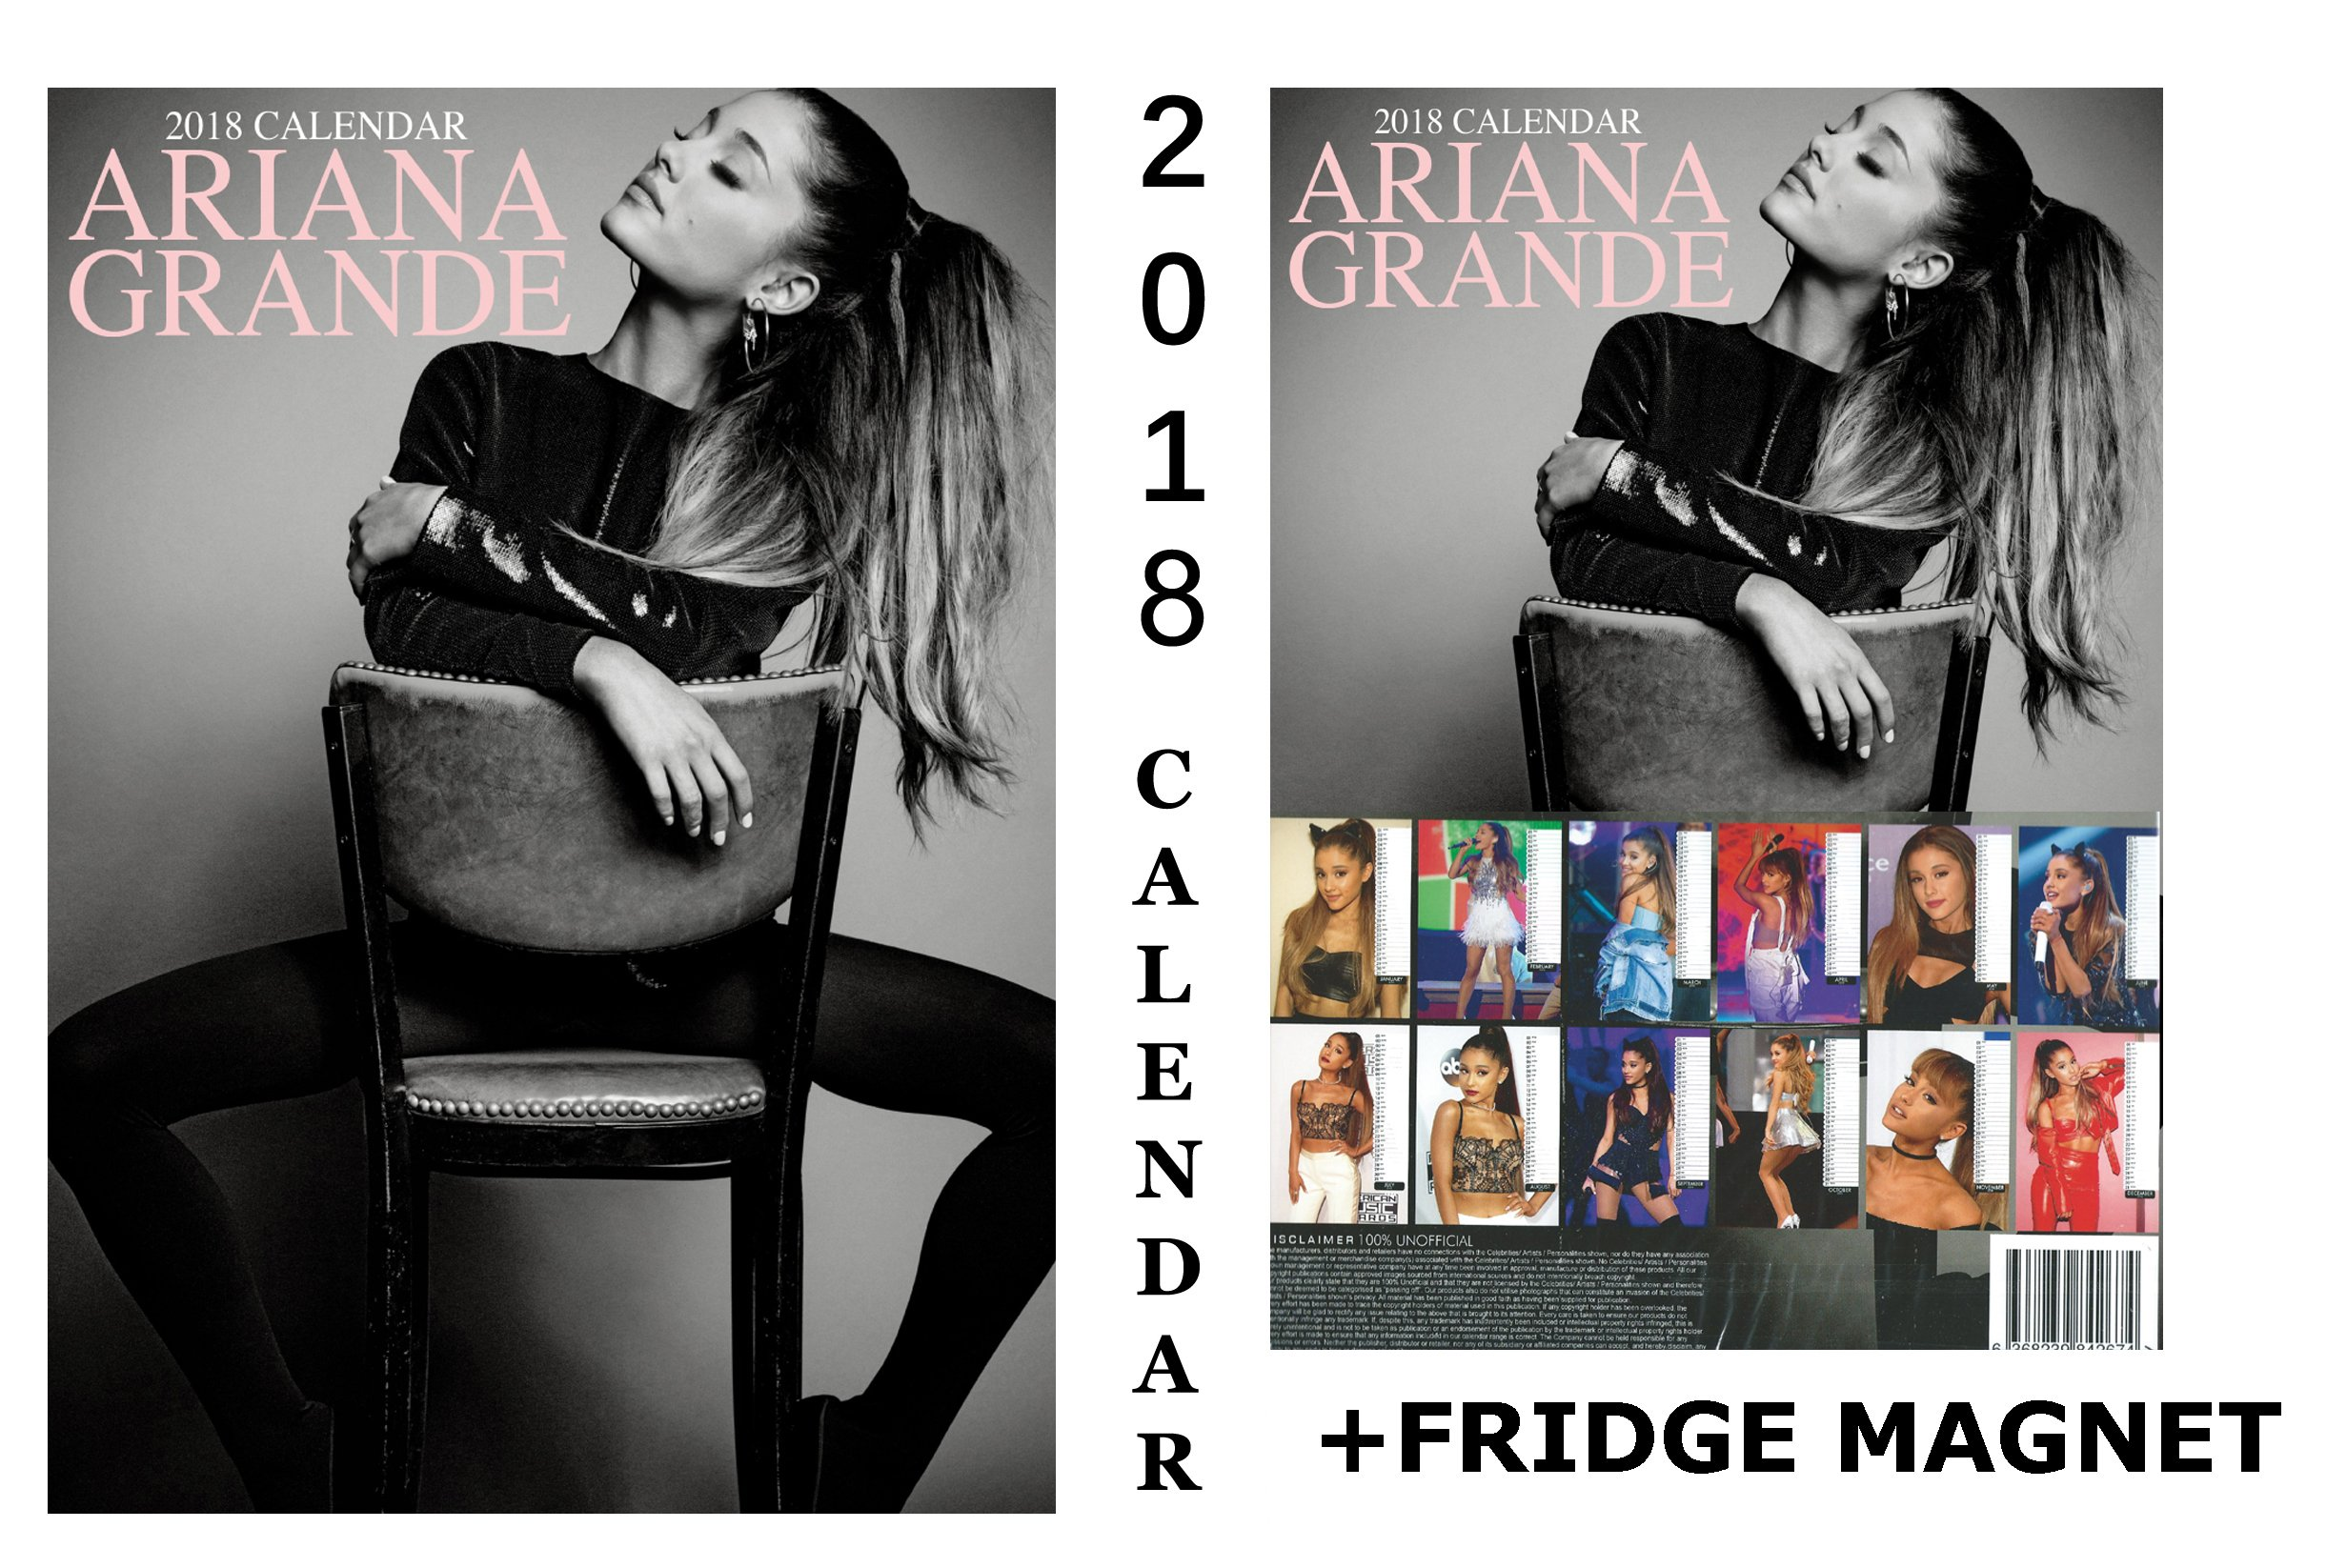 ARIANA GRANDE CALENDAR 2018 + ARIANA GRANDE FRIDGE MAGNET